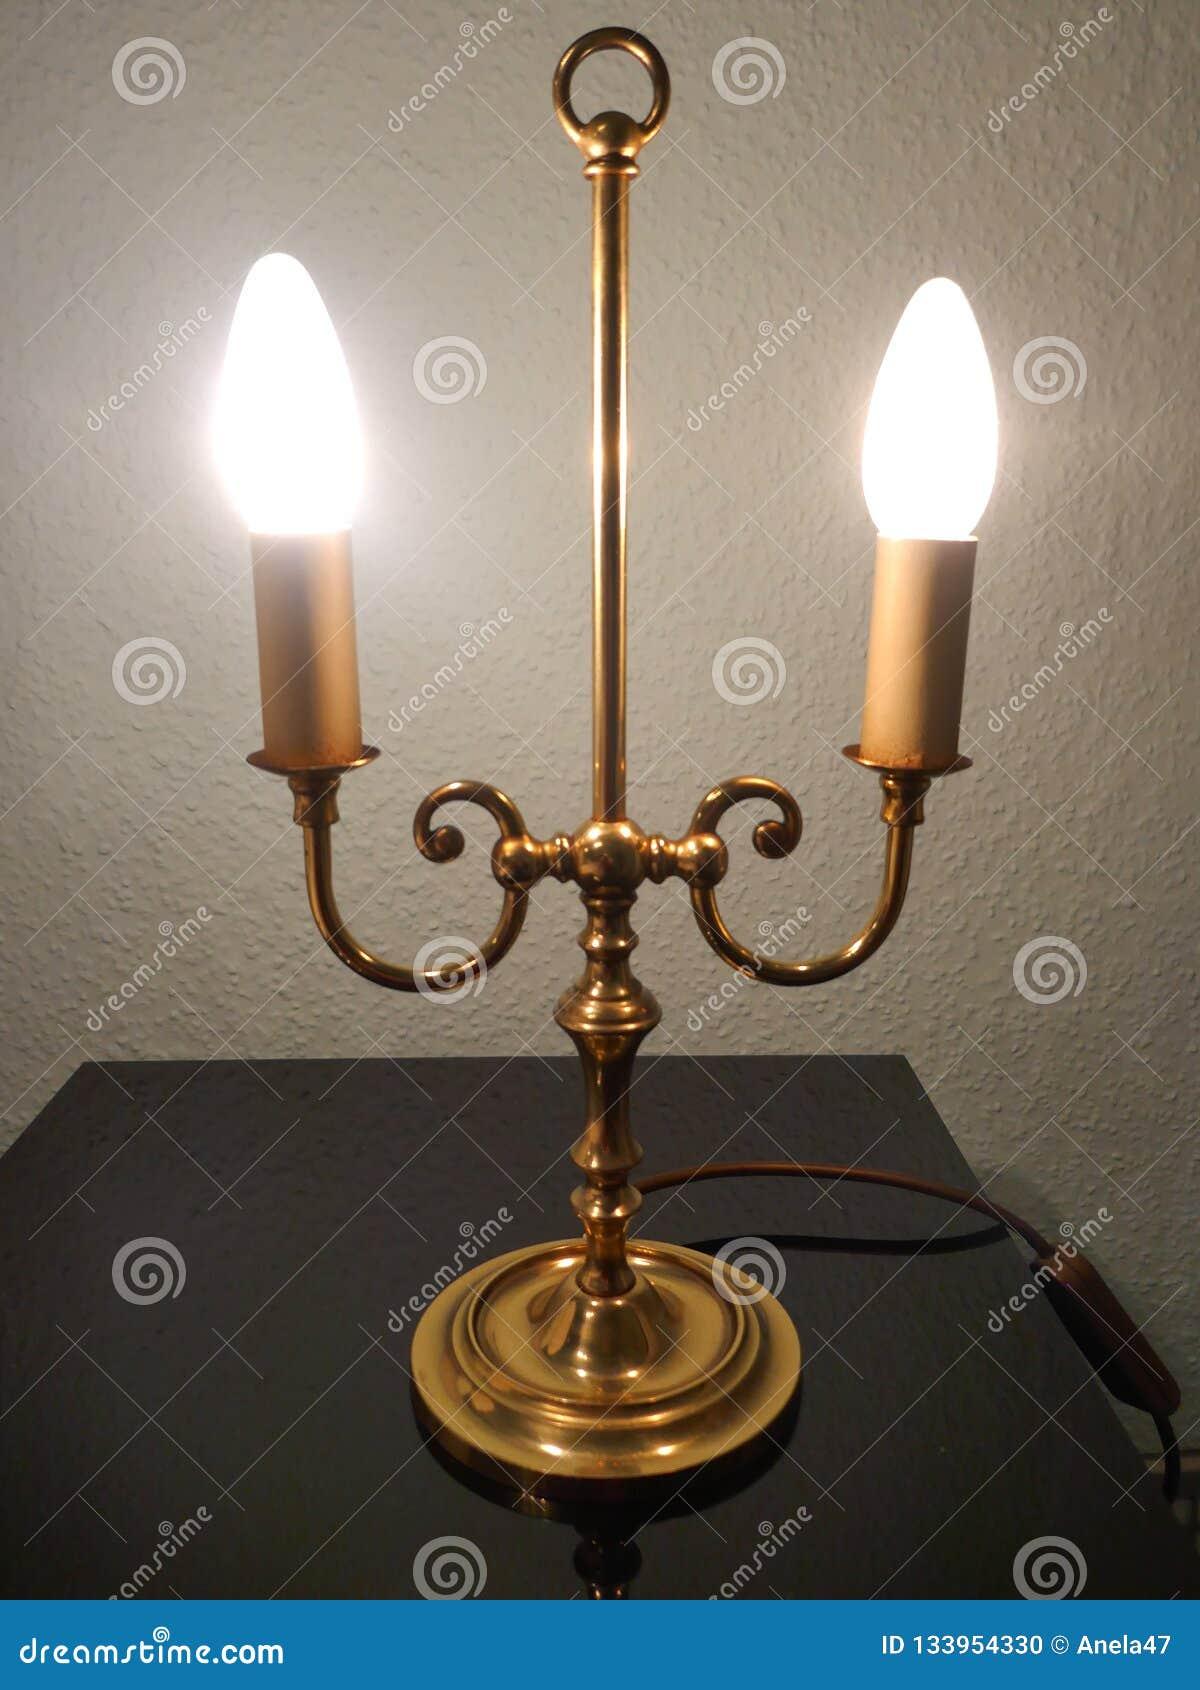 Lampe, Tischlampe, Messing mit den leuchtenden Kerzenlampen, klassisch, elegant, Retrostil